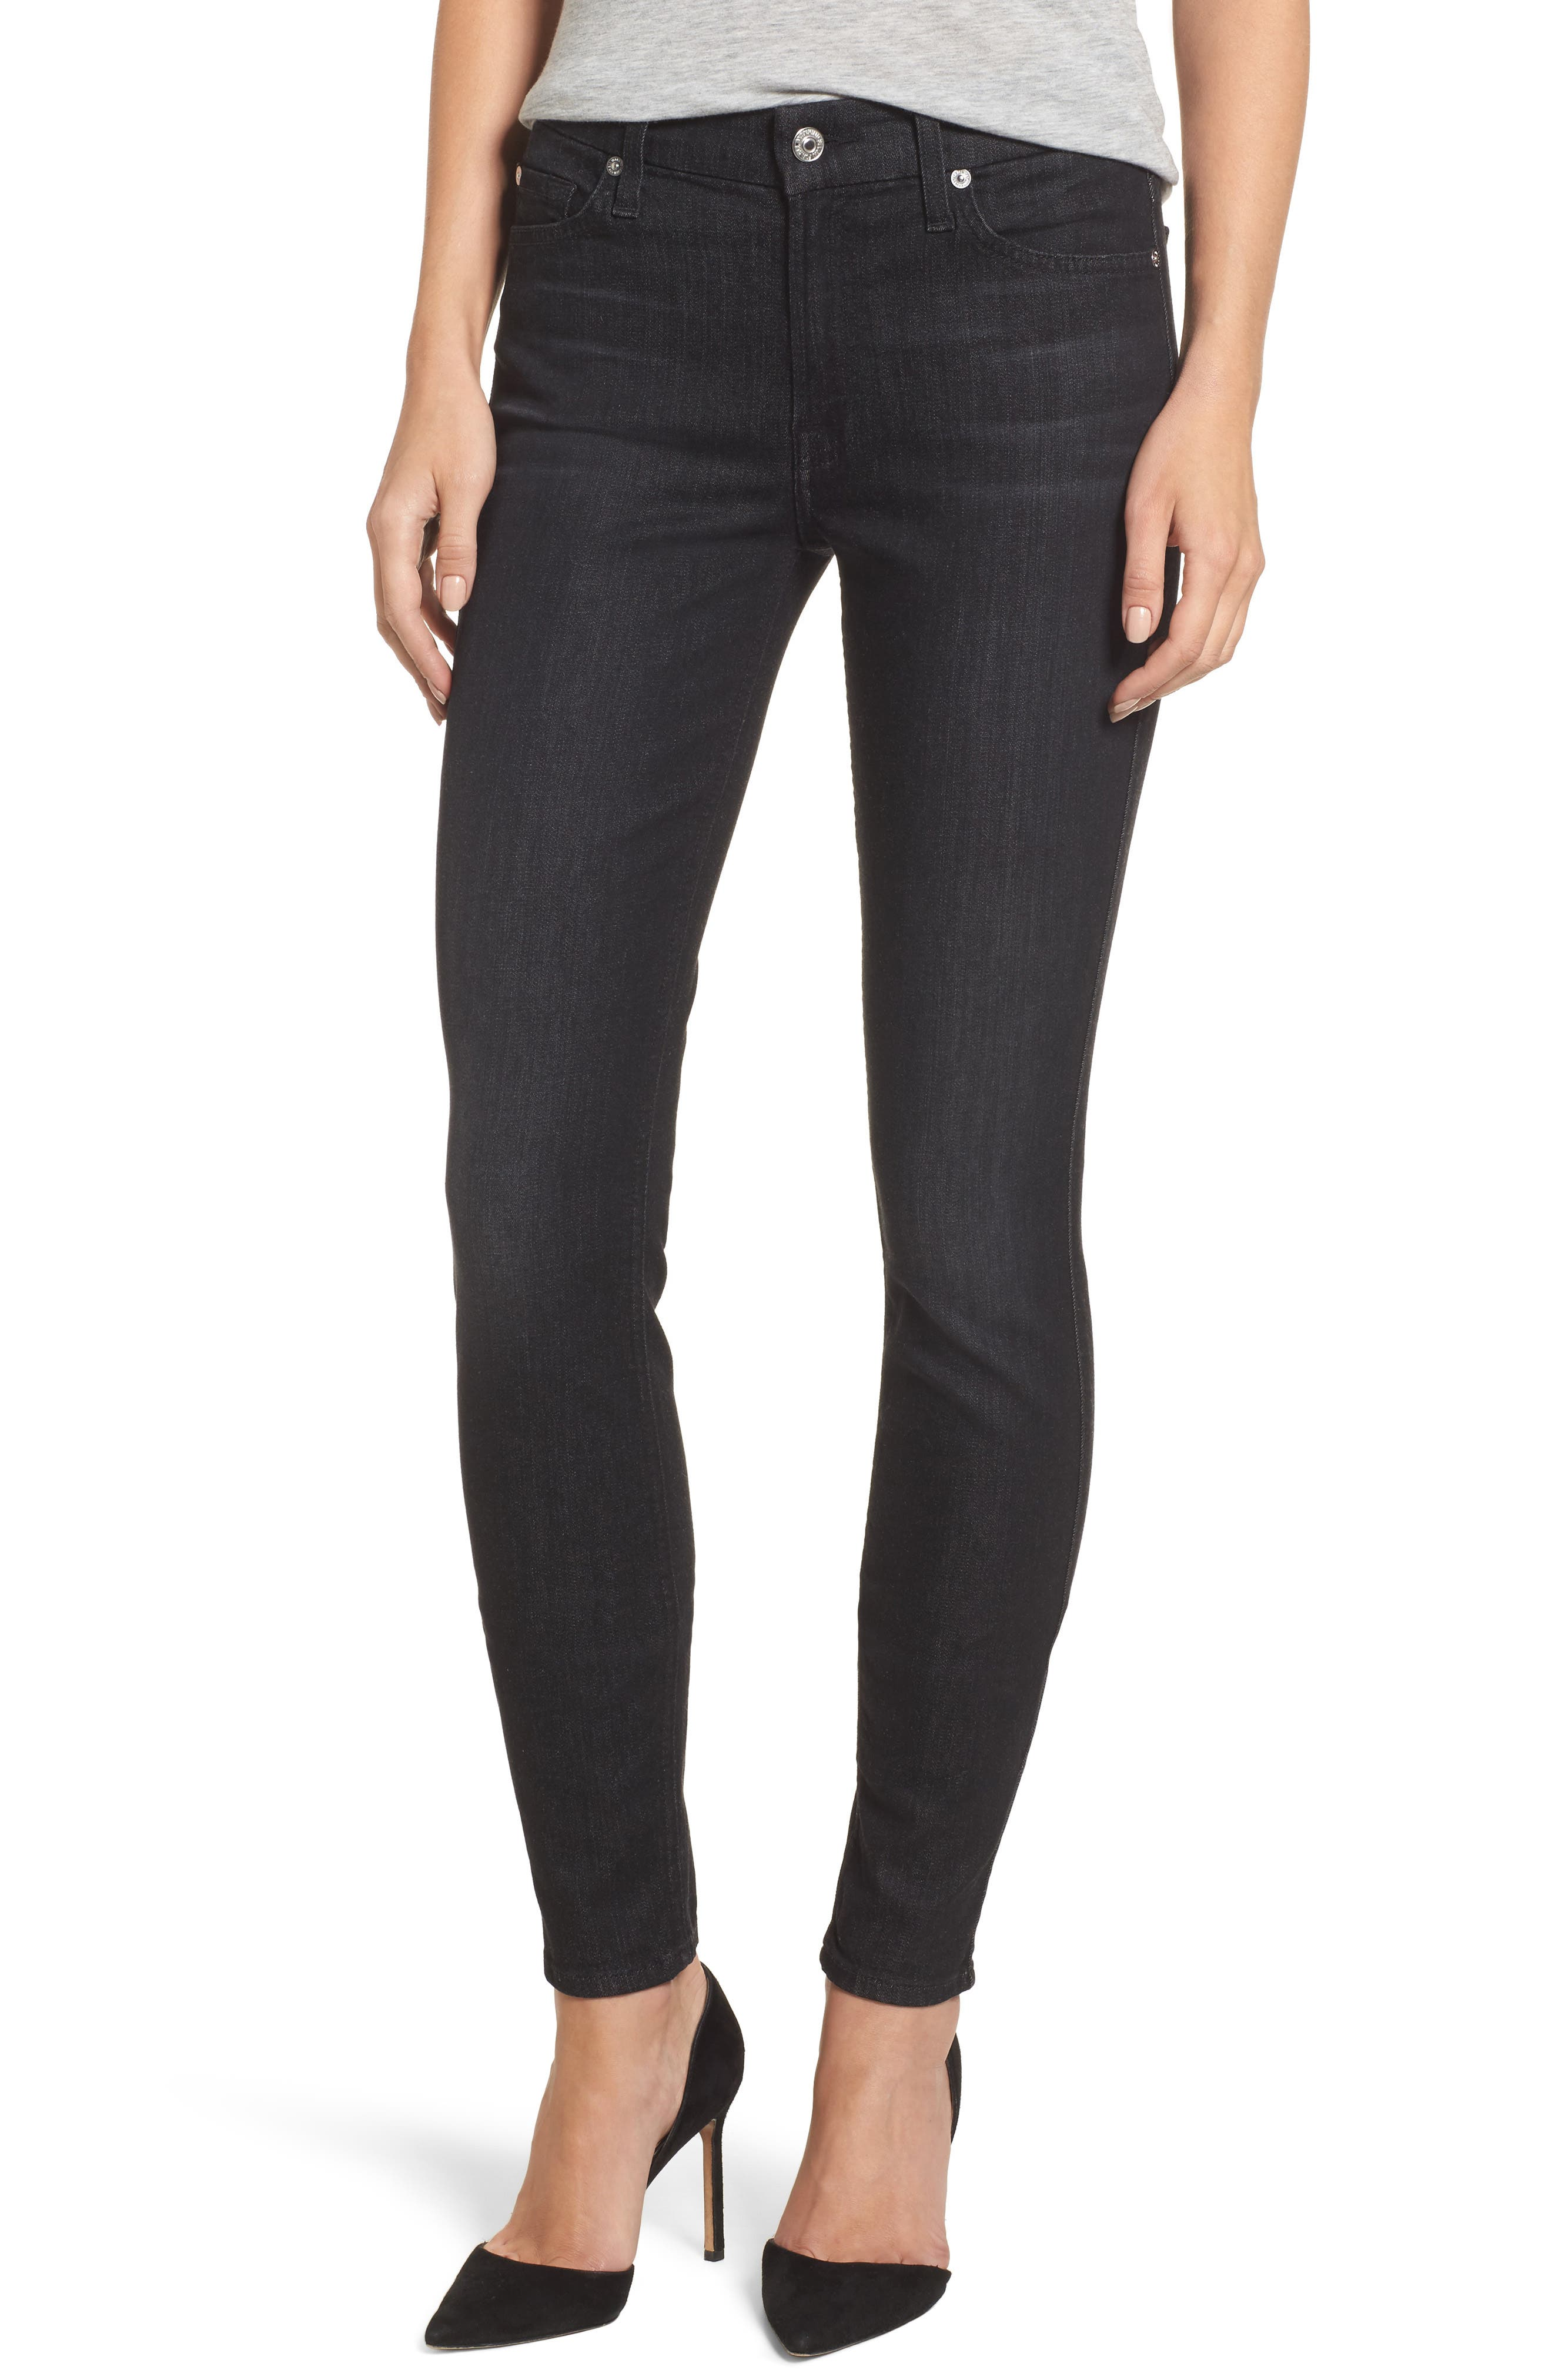 b(air) - The Skinny High Waist Jeans,                             Main thumbnail 1, color,                             Bair Noir